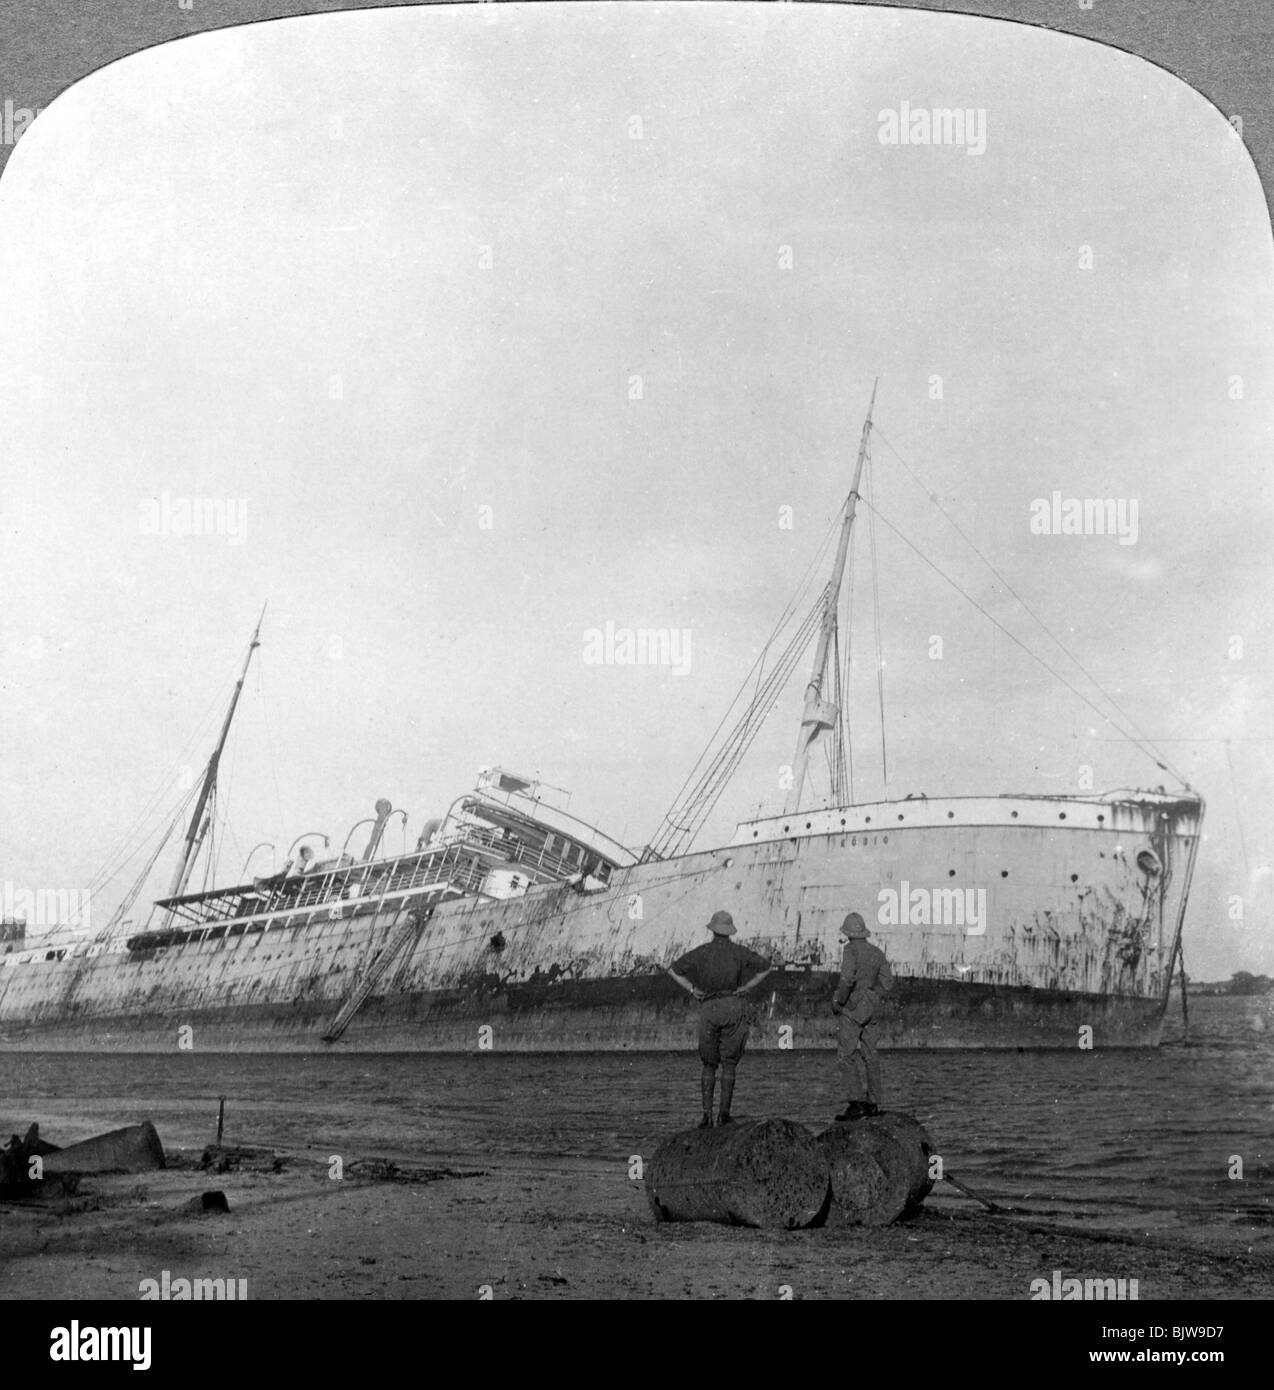 German cruiser sunk off Dar es Salaam, Tanzania, World War I, 1914-1918. - Stock Image